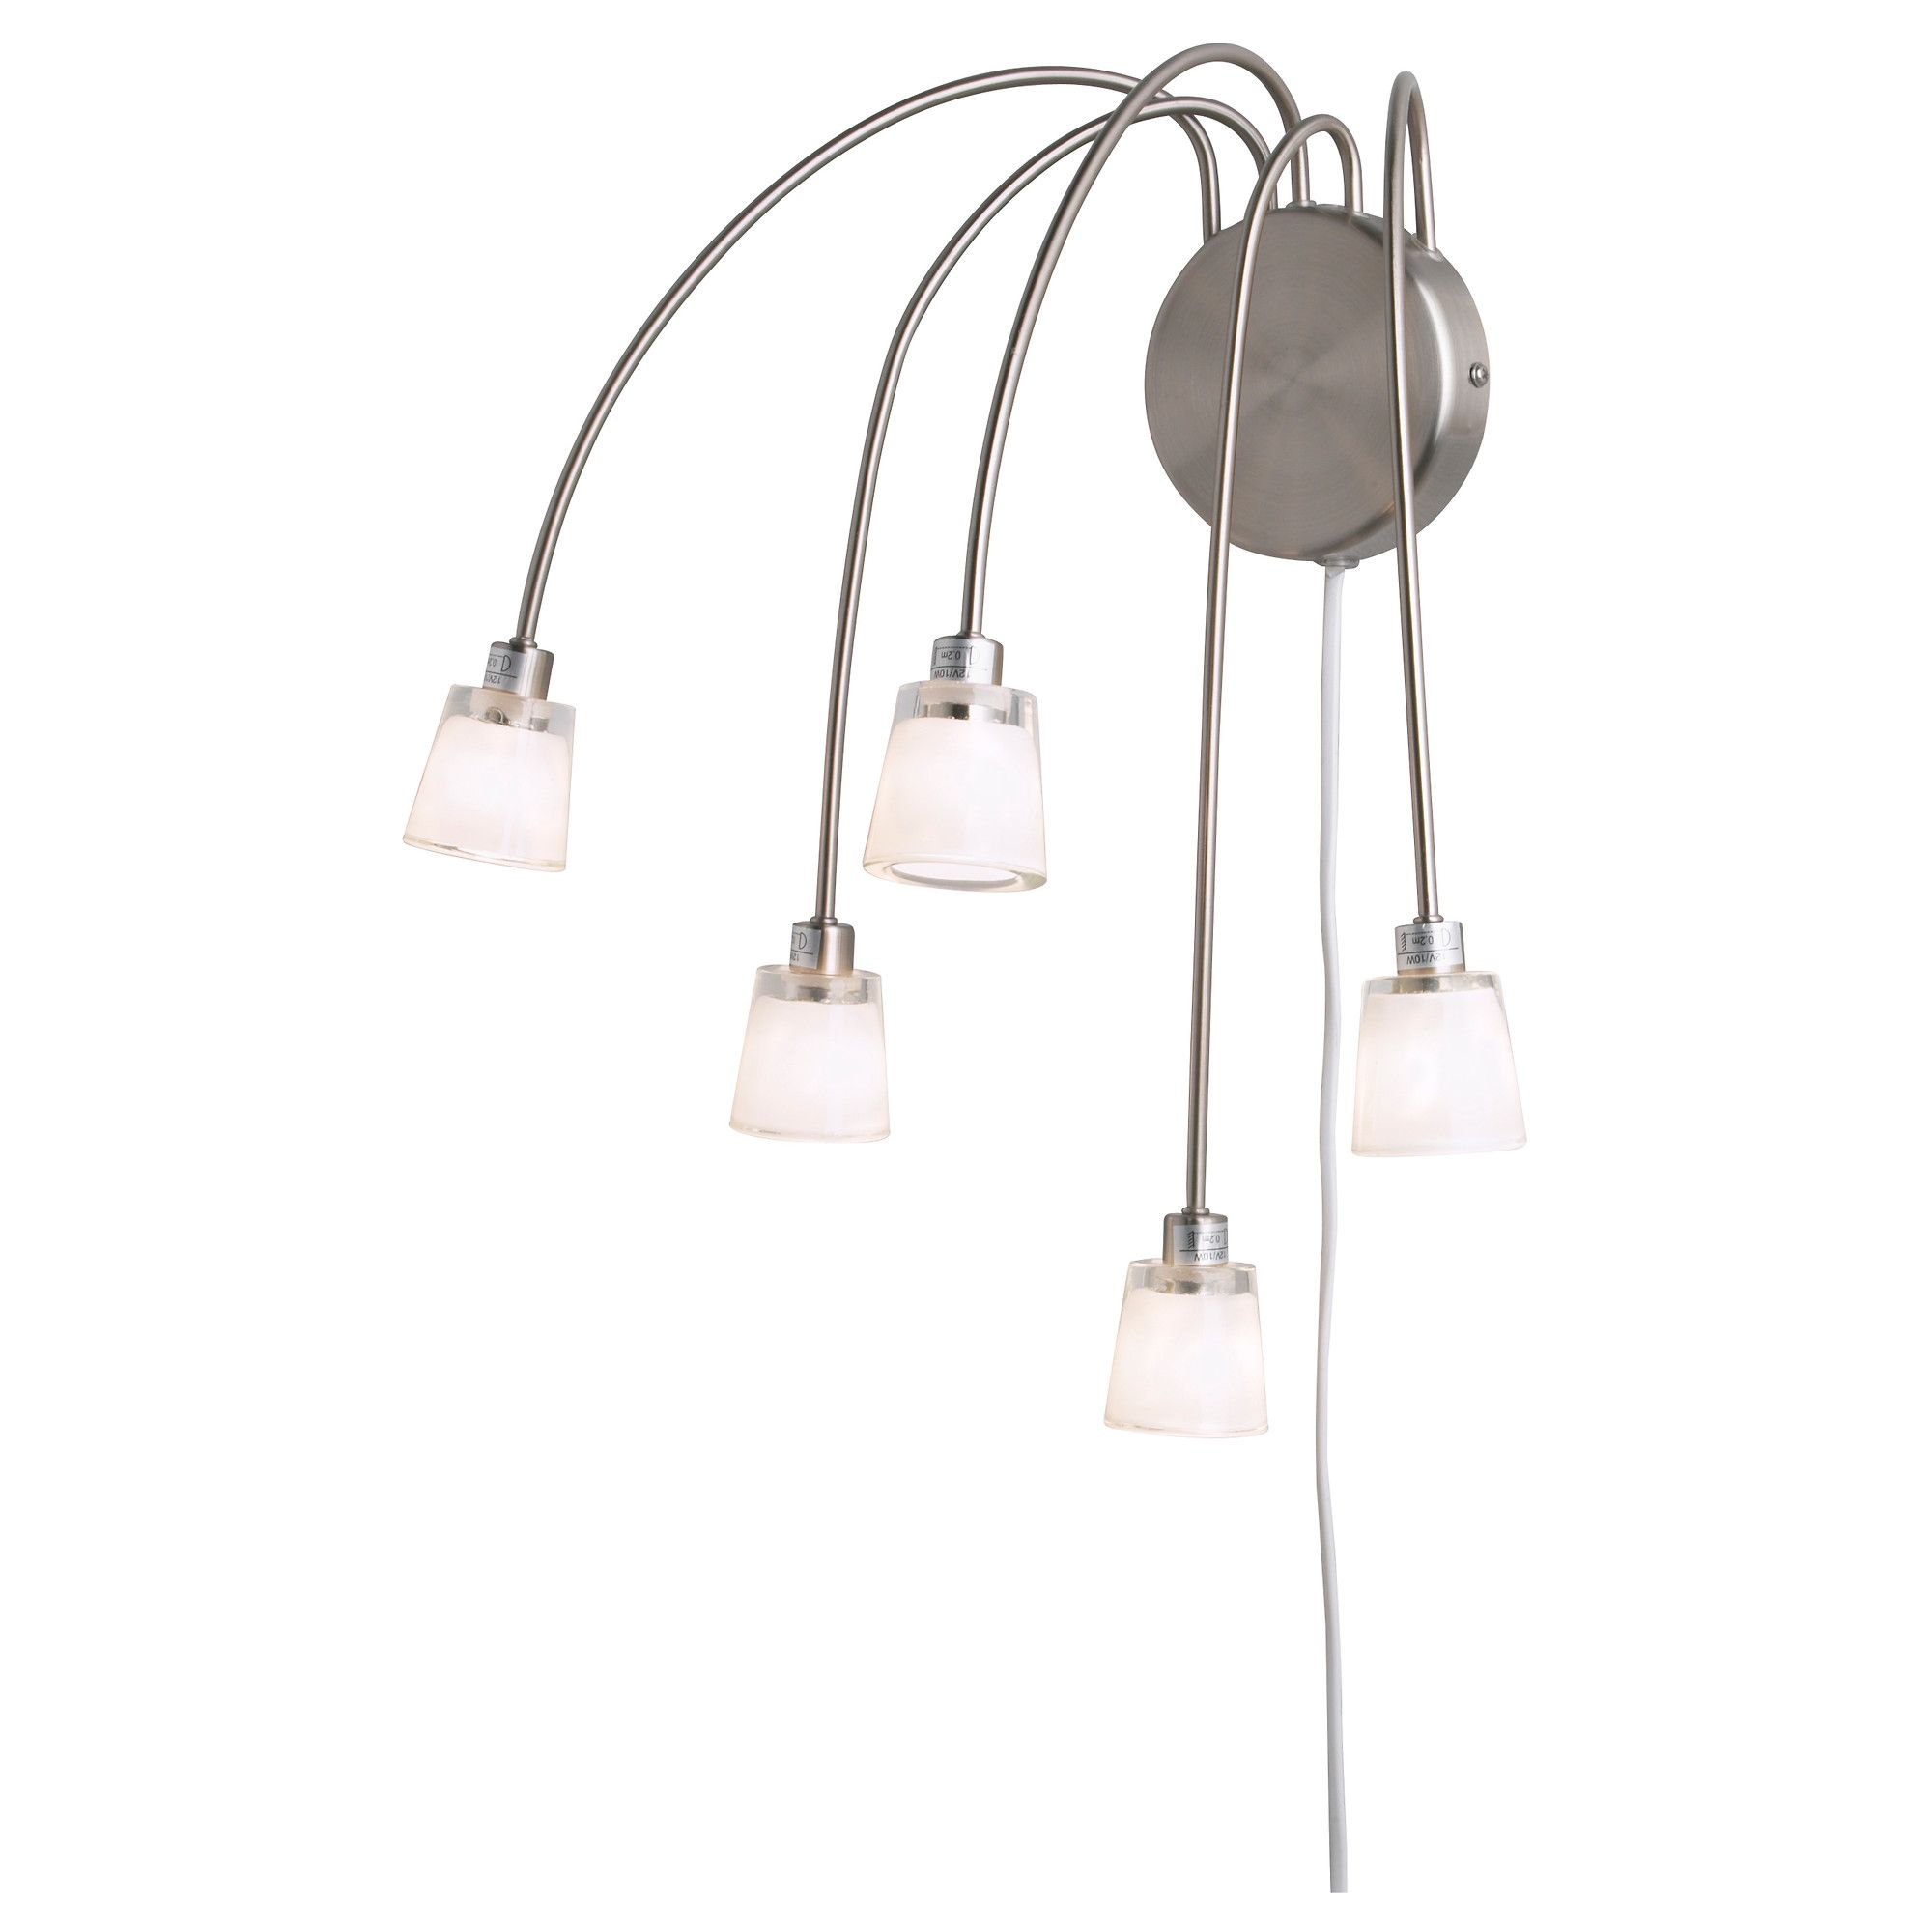 ikea wall lighting. kryssbo wall lamp ikea for side of small dressing table mb two hc shirts ikea lighting a